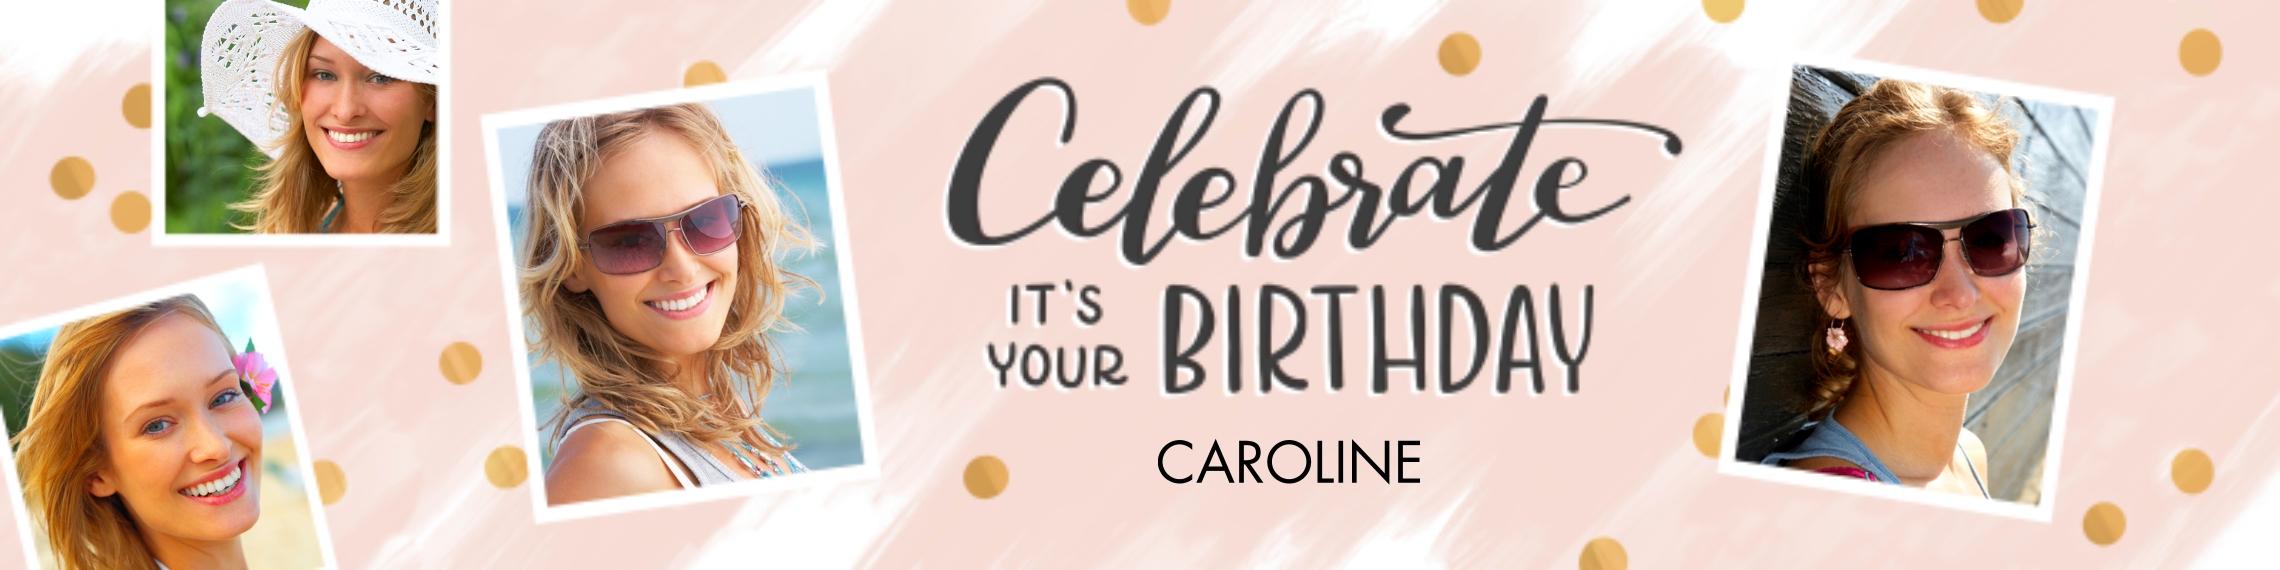 Birthday 2x8 Adhesive Banner, Home Décor -Confetti Celebration